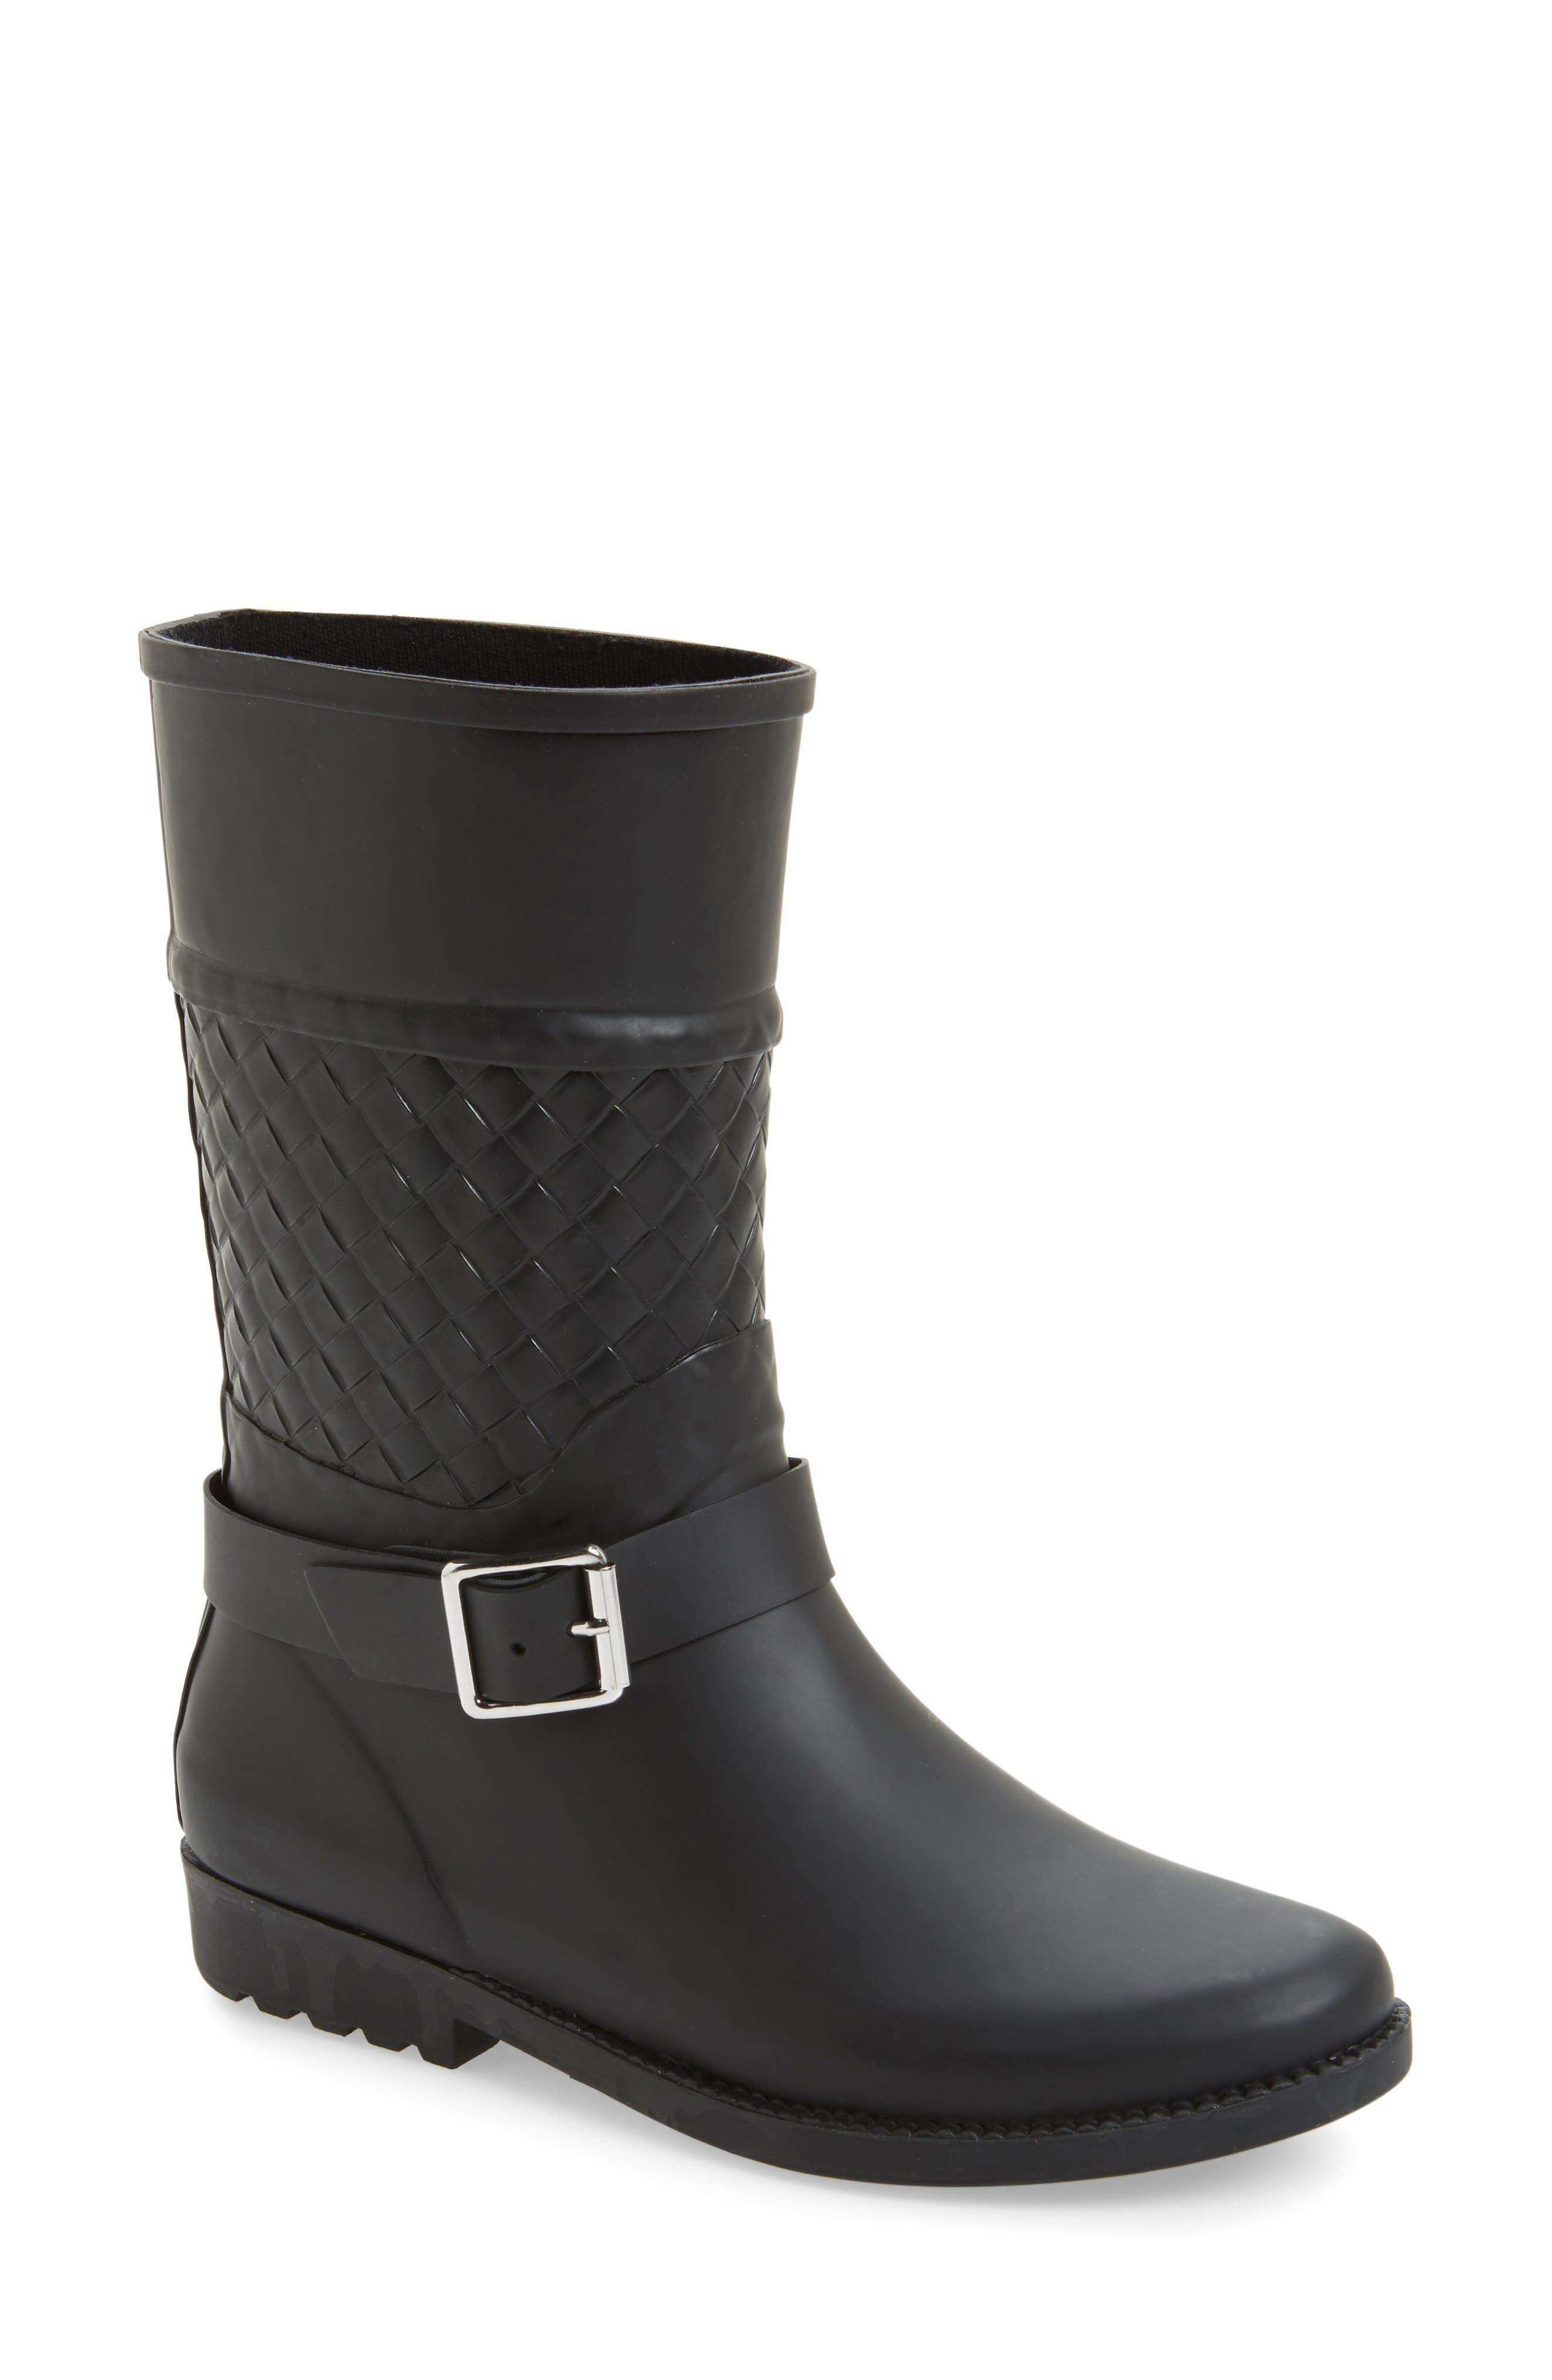 Waterproof Woven Shaft Rain Boot,                         Main,                         color,